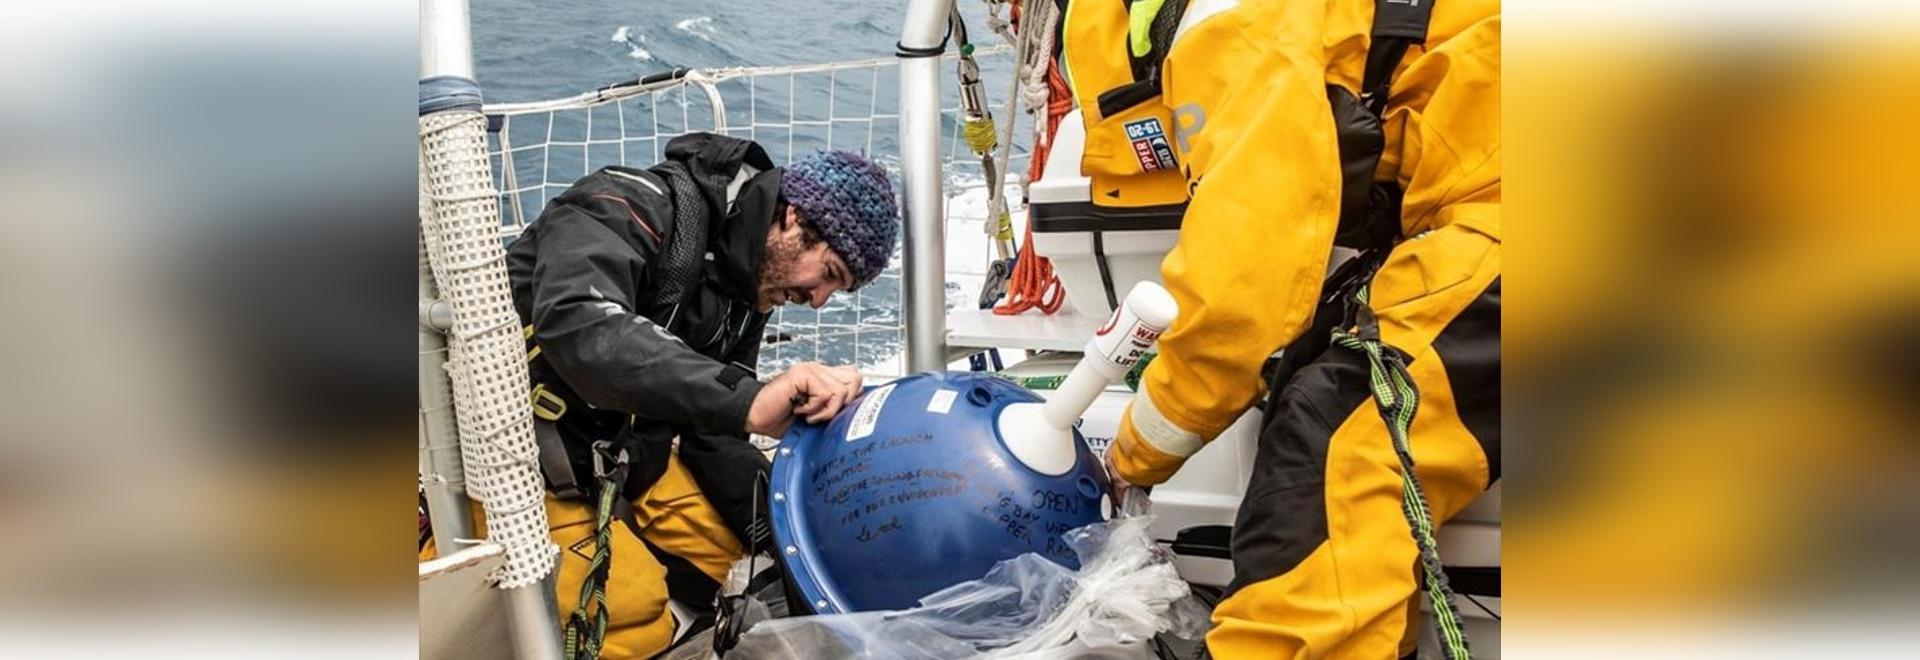 The crew of Clipper Race vessel CV26, Ha Long Bay Viet Nam, deploys the data-transmitting drifter buoy